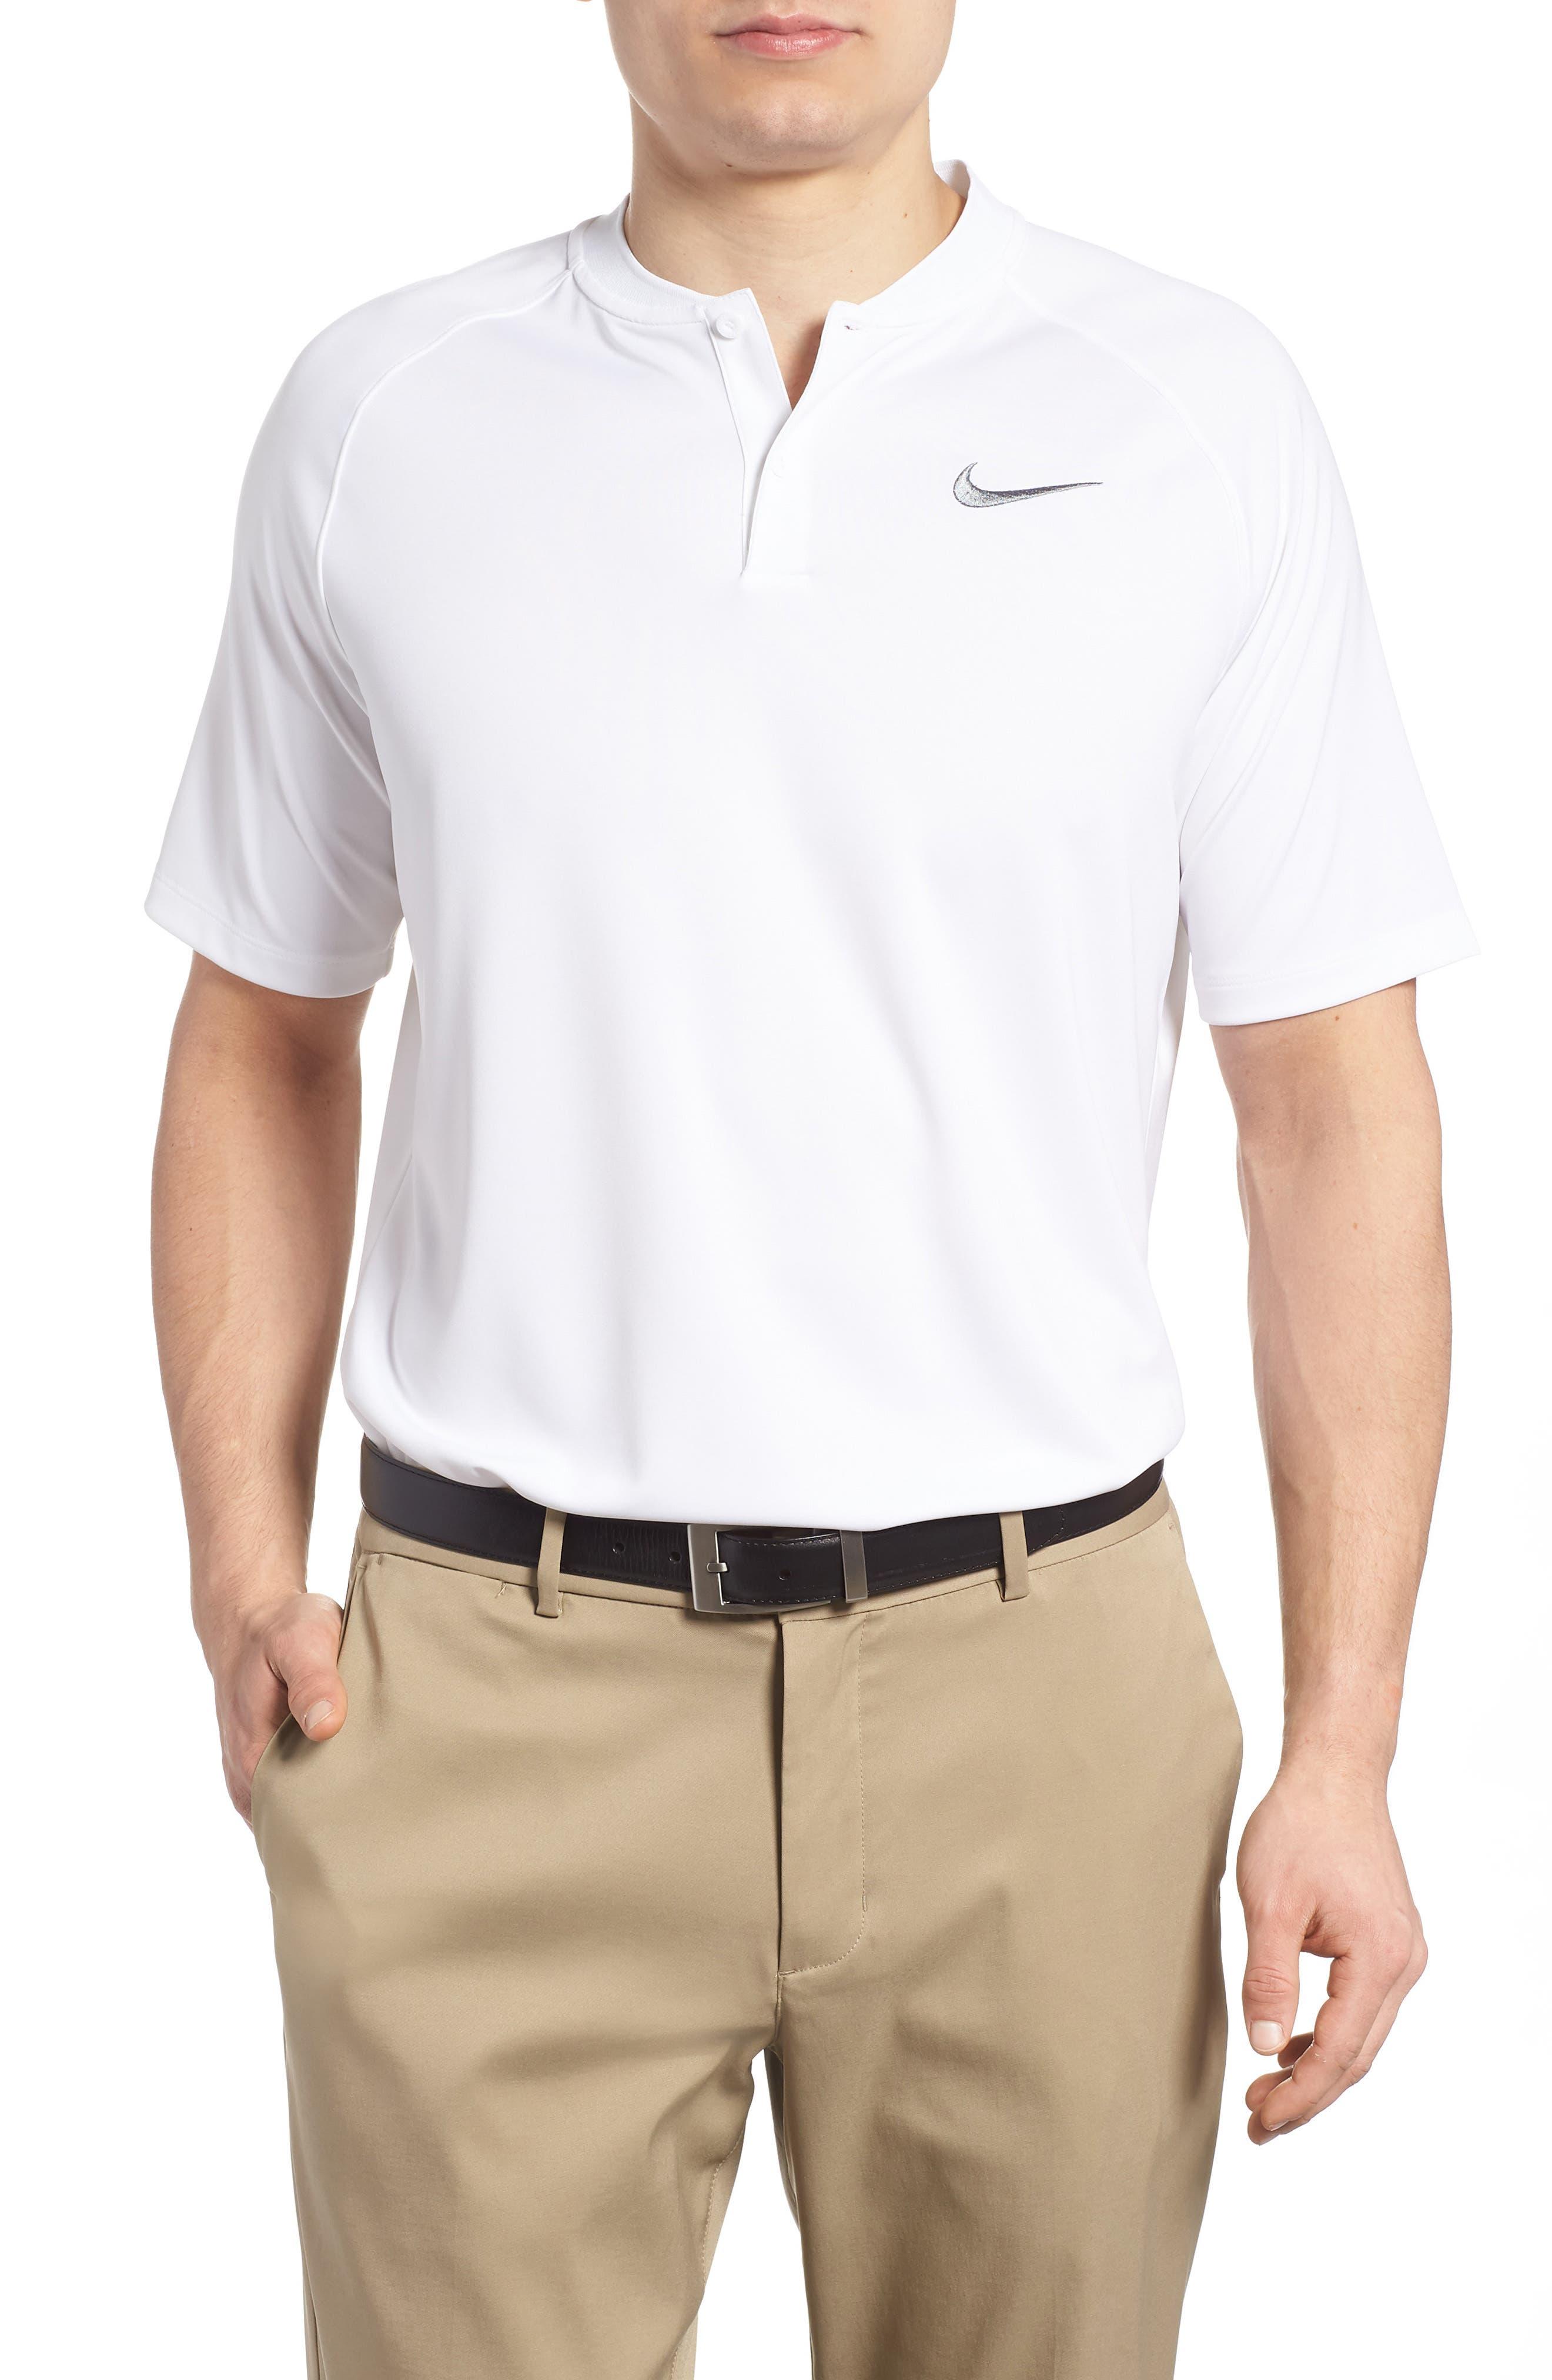 Dry Momentum Golf Polo,                             Main thumbnail 1, color,                             White/ White/ Black